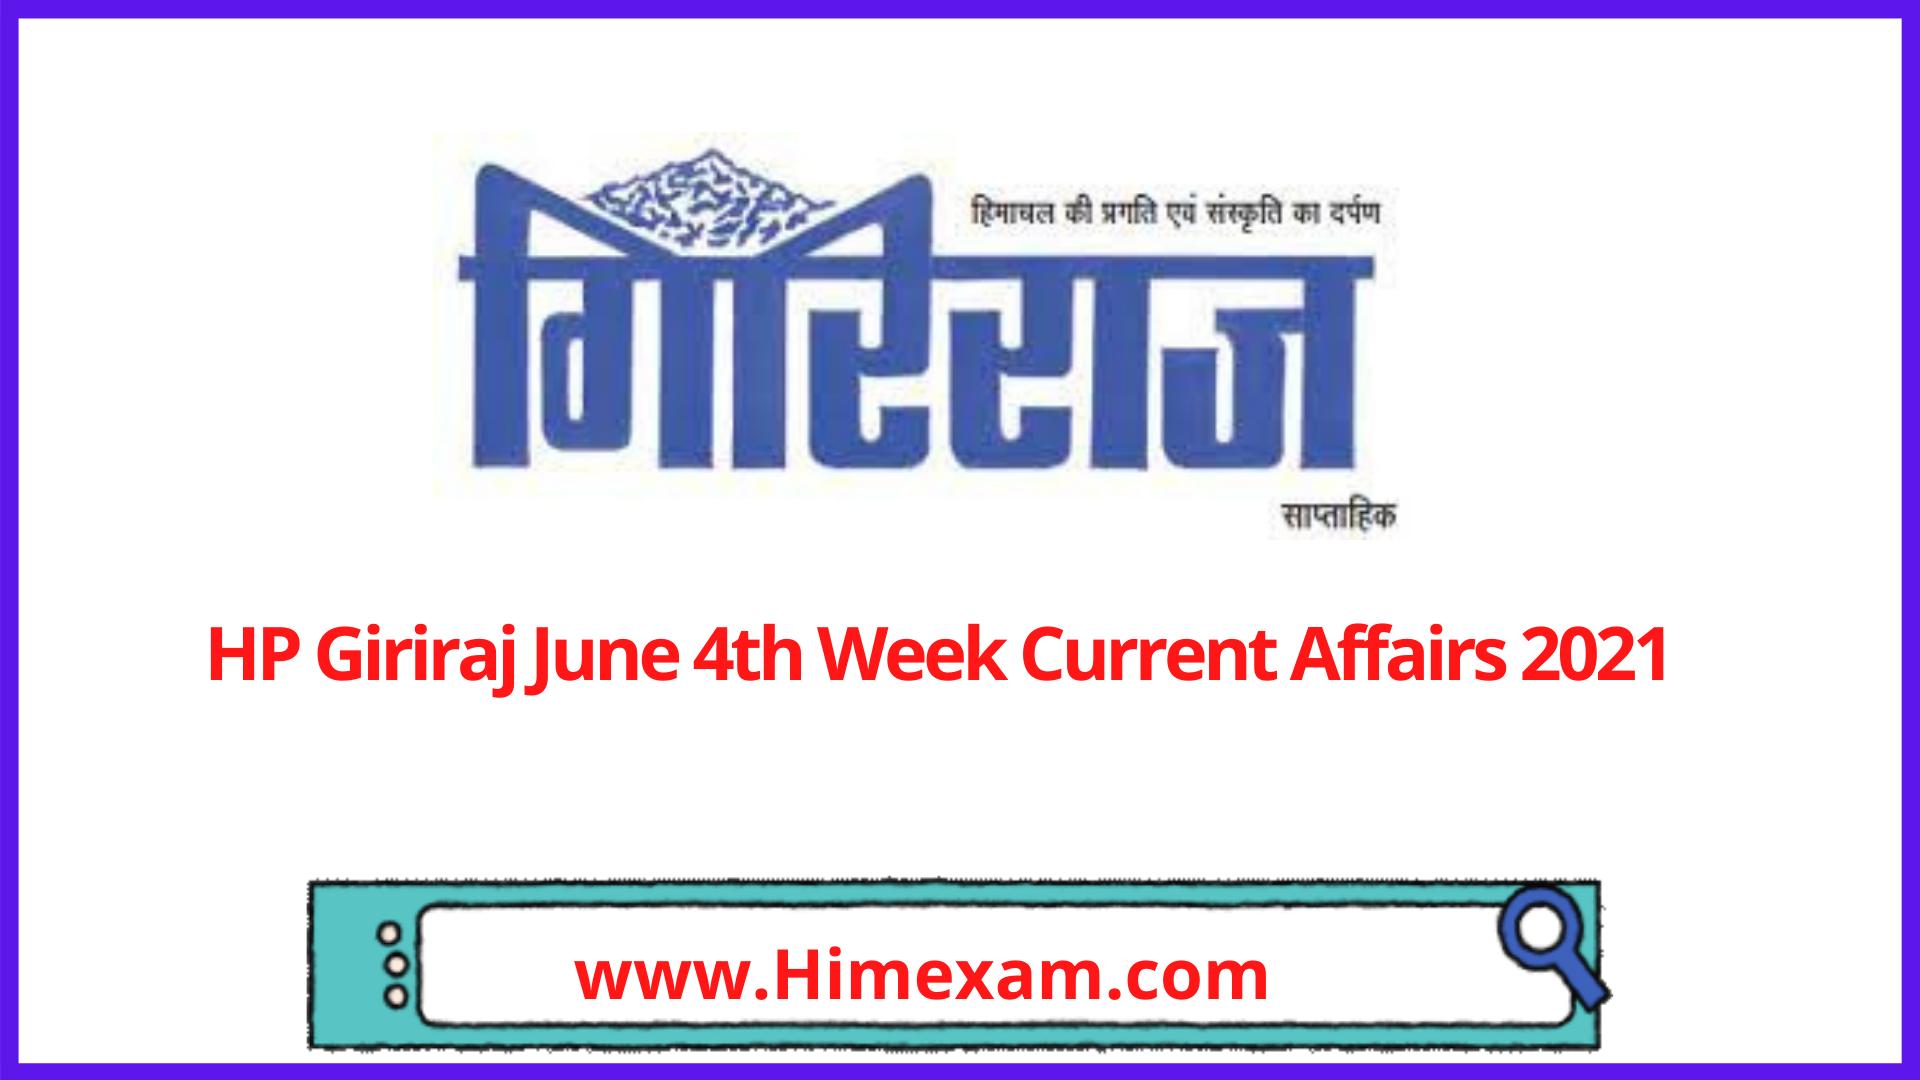 HP Giriraj June 4th  Week Current Affairs 2021